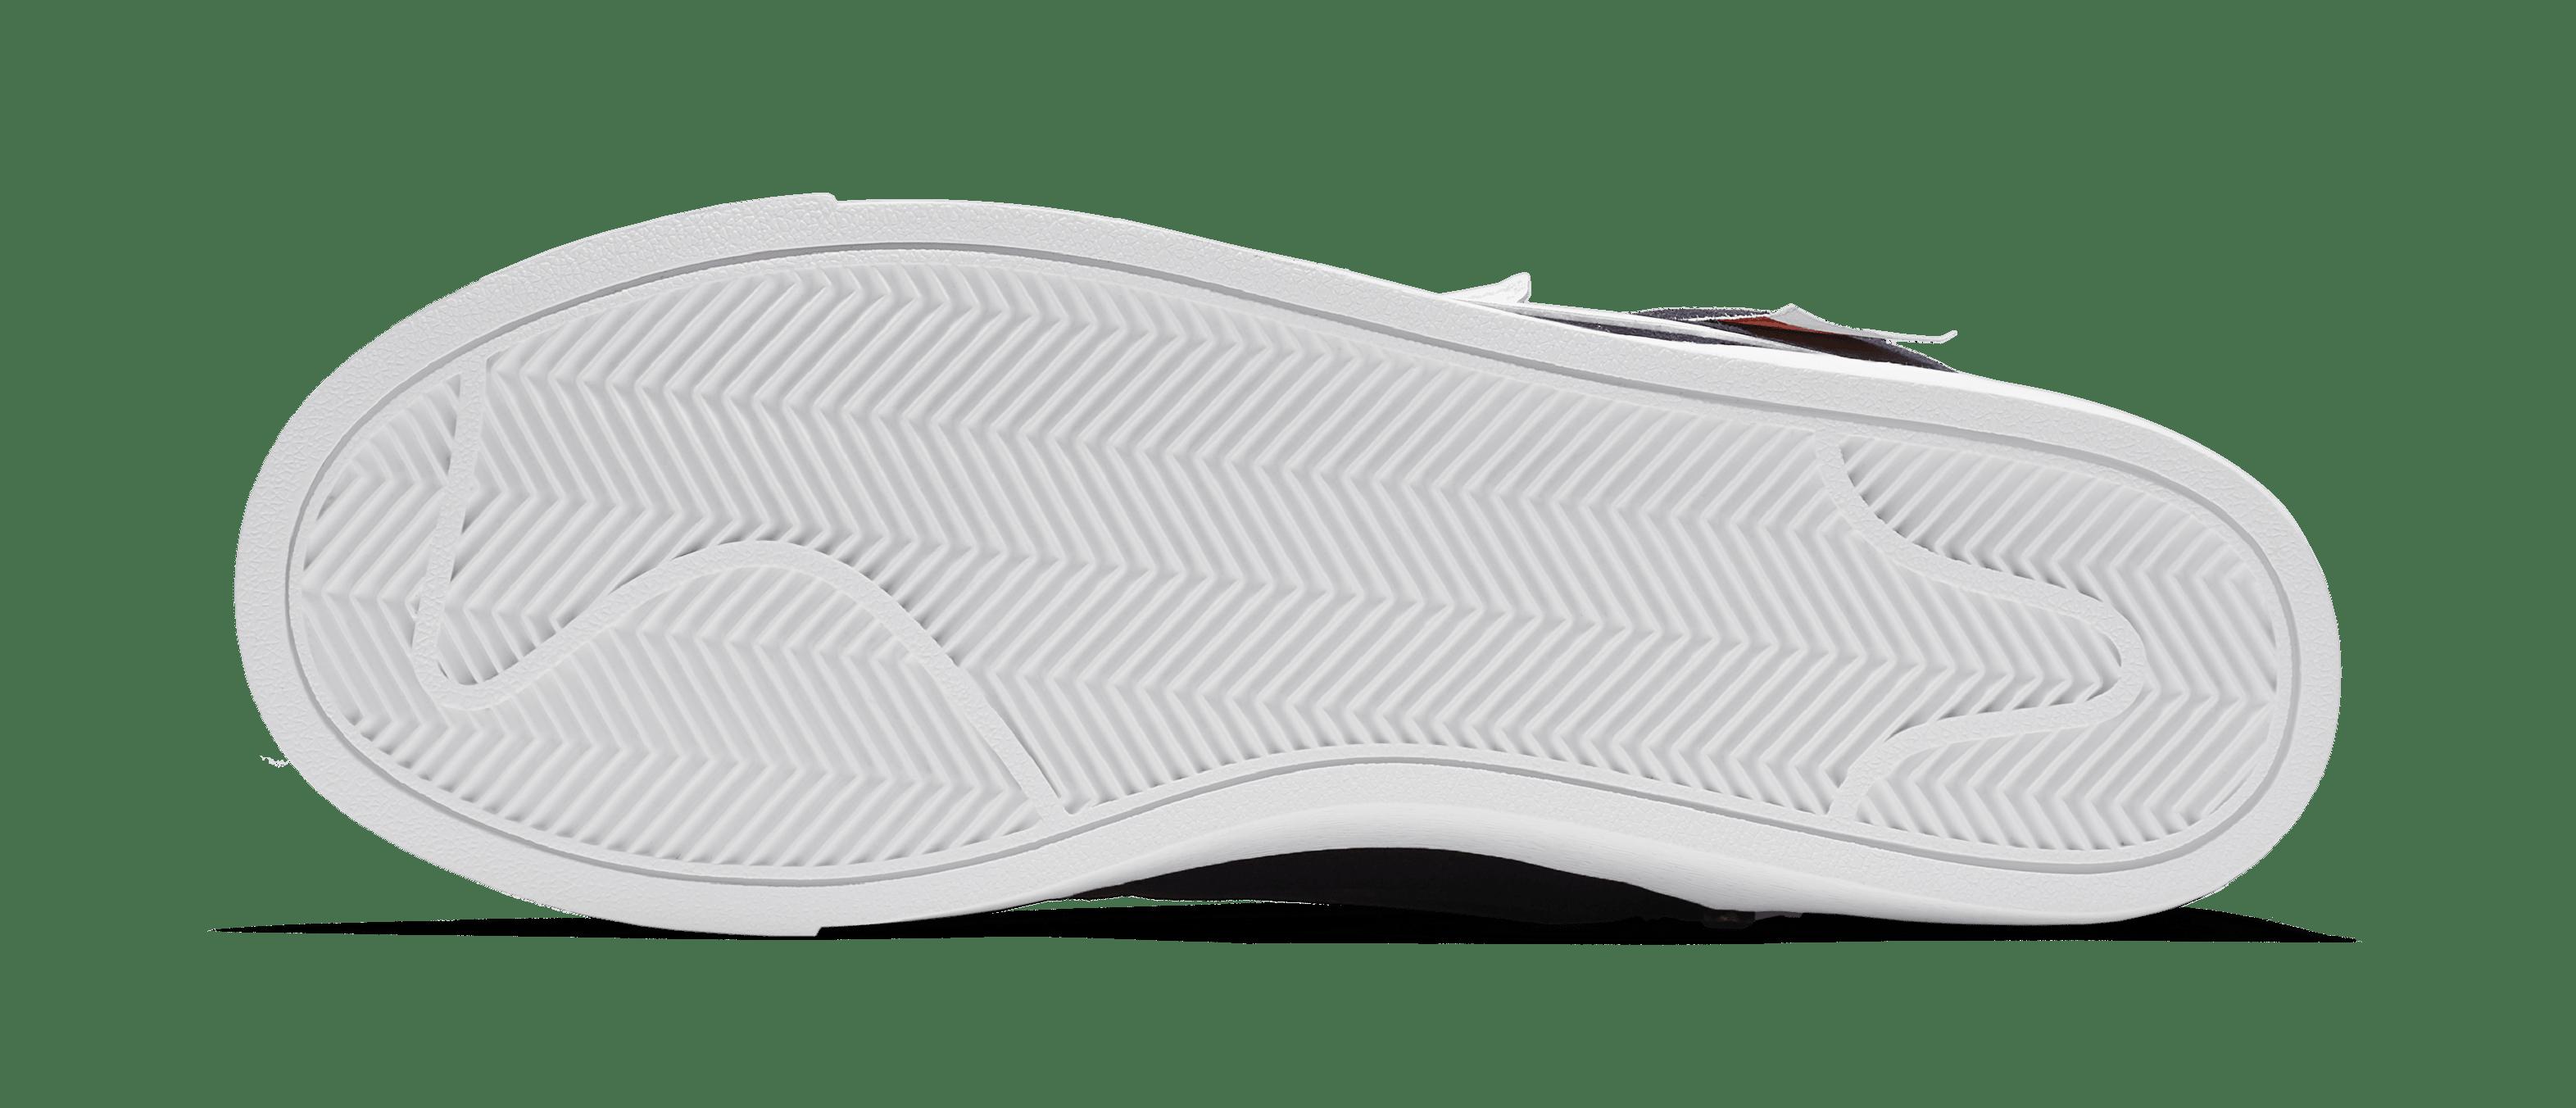 Nike WMNS Blazer Rebel 'Blackened Blue' BQ4022-401 (Sole)